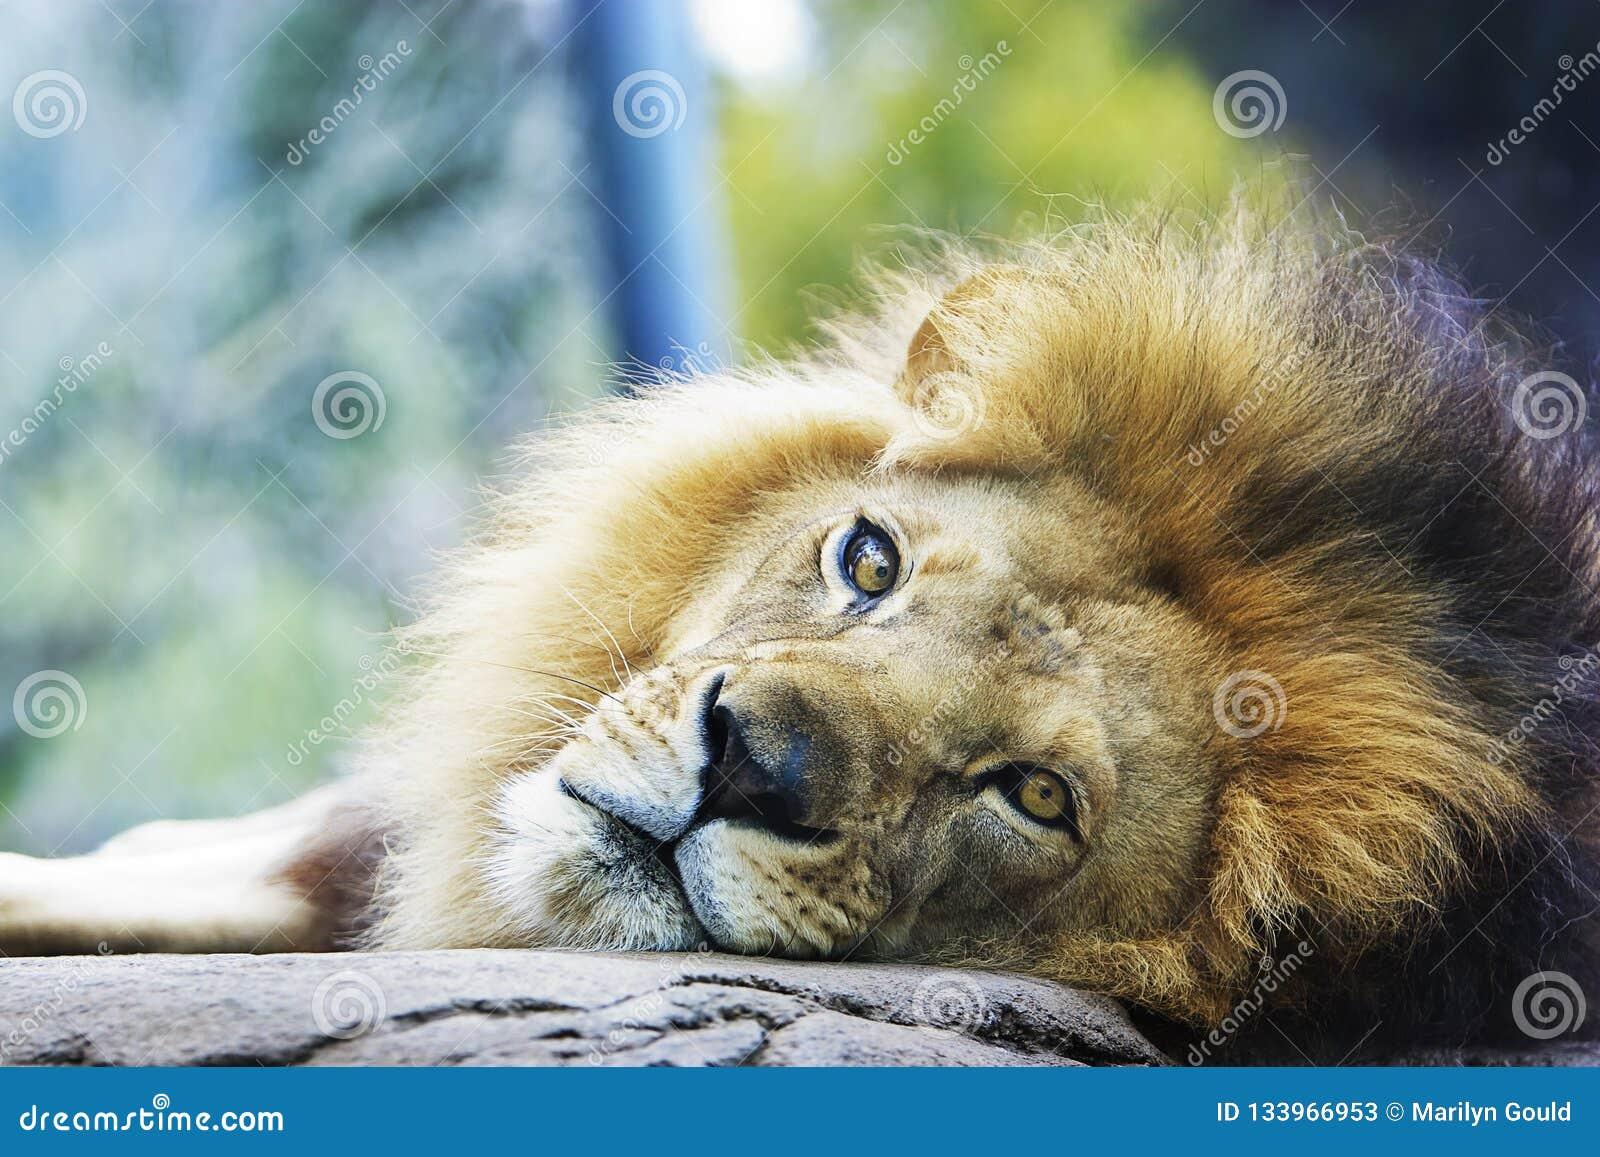 Lion Resting Head on Rock